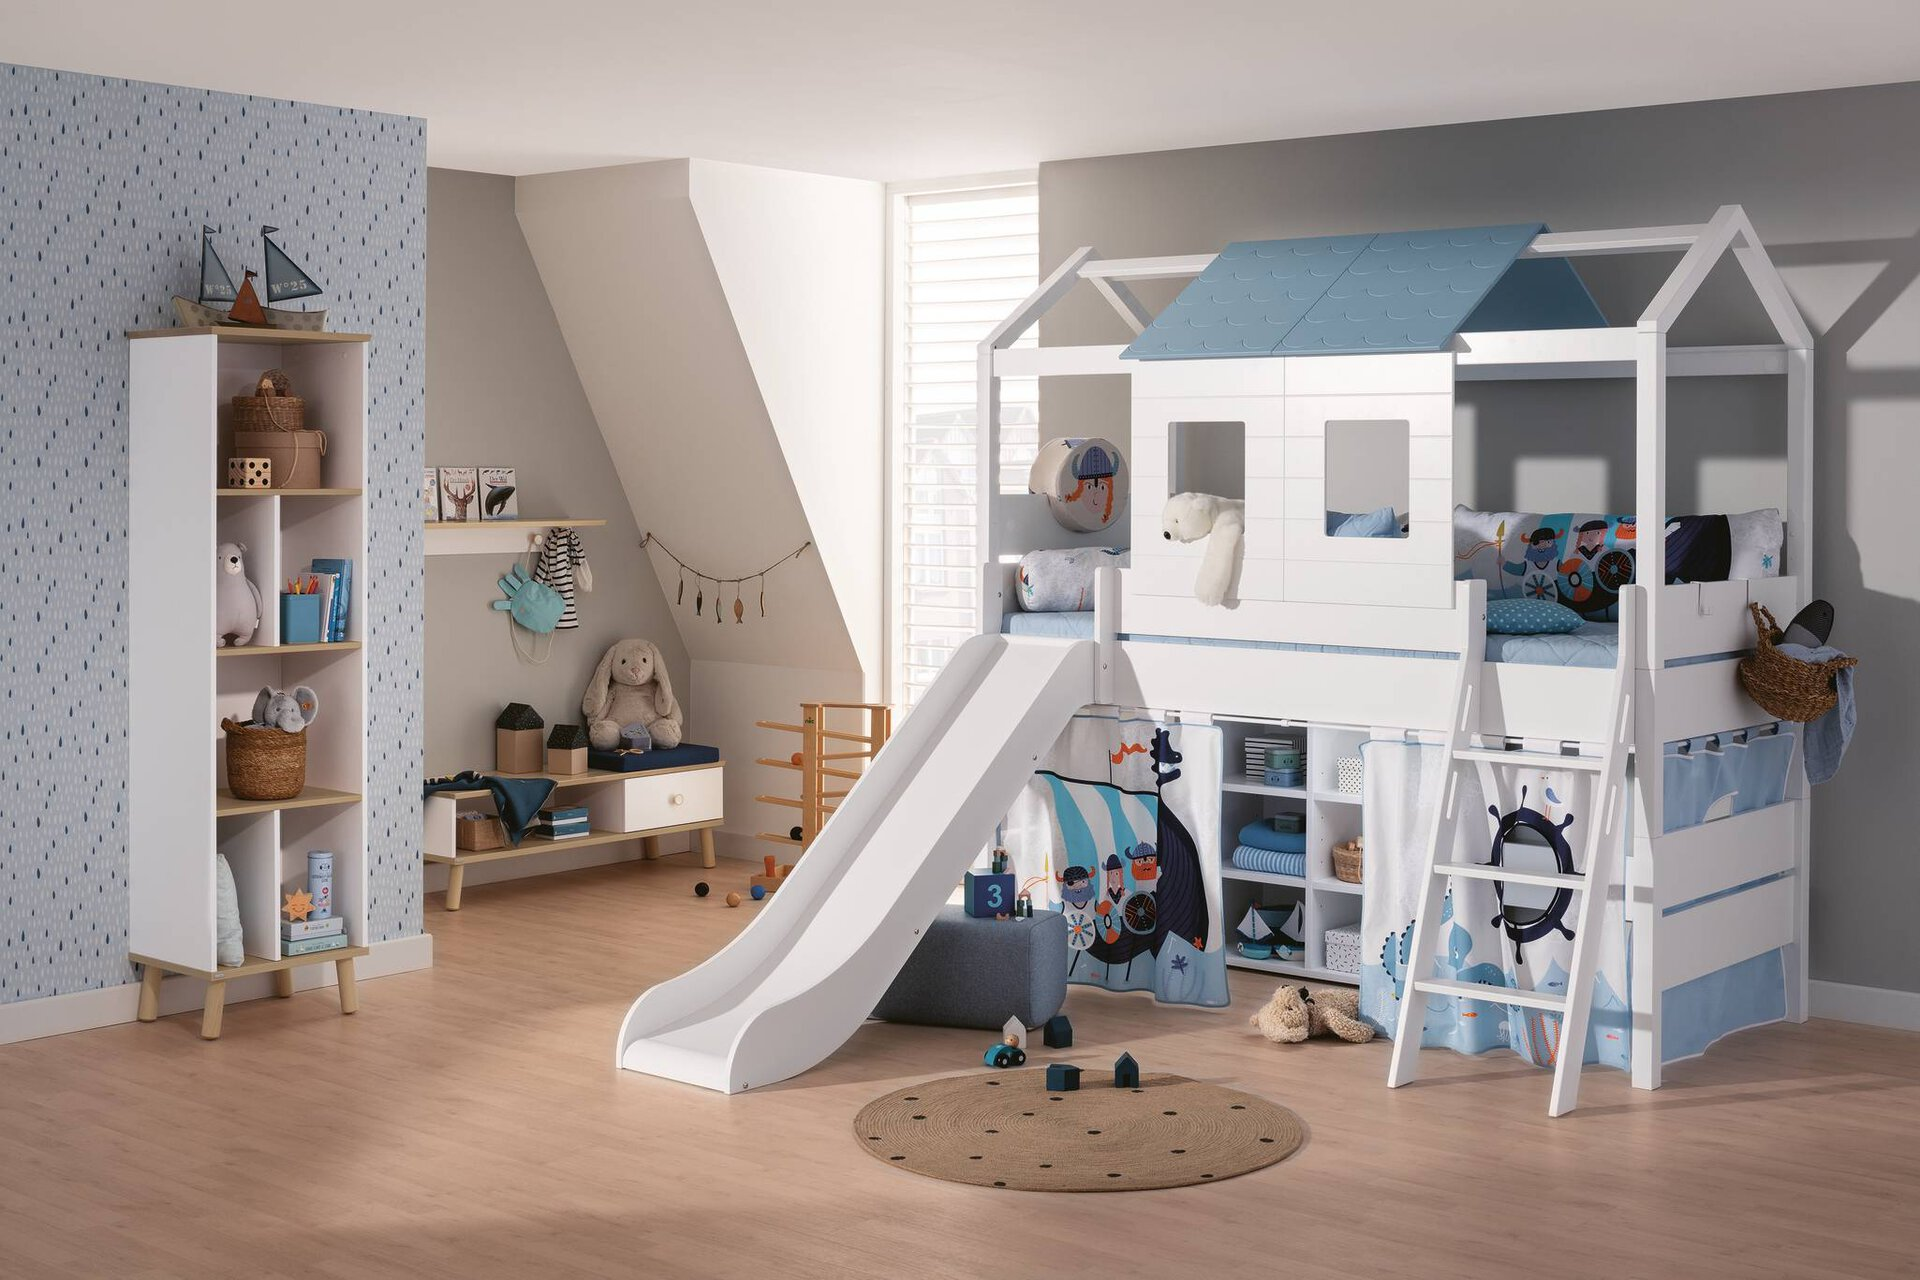 Spiel- Hochbett TINY HOUSE PAIDI Holzwerkstoff weiß 210 x 135 x 215 cm